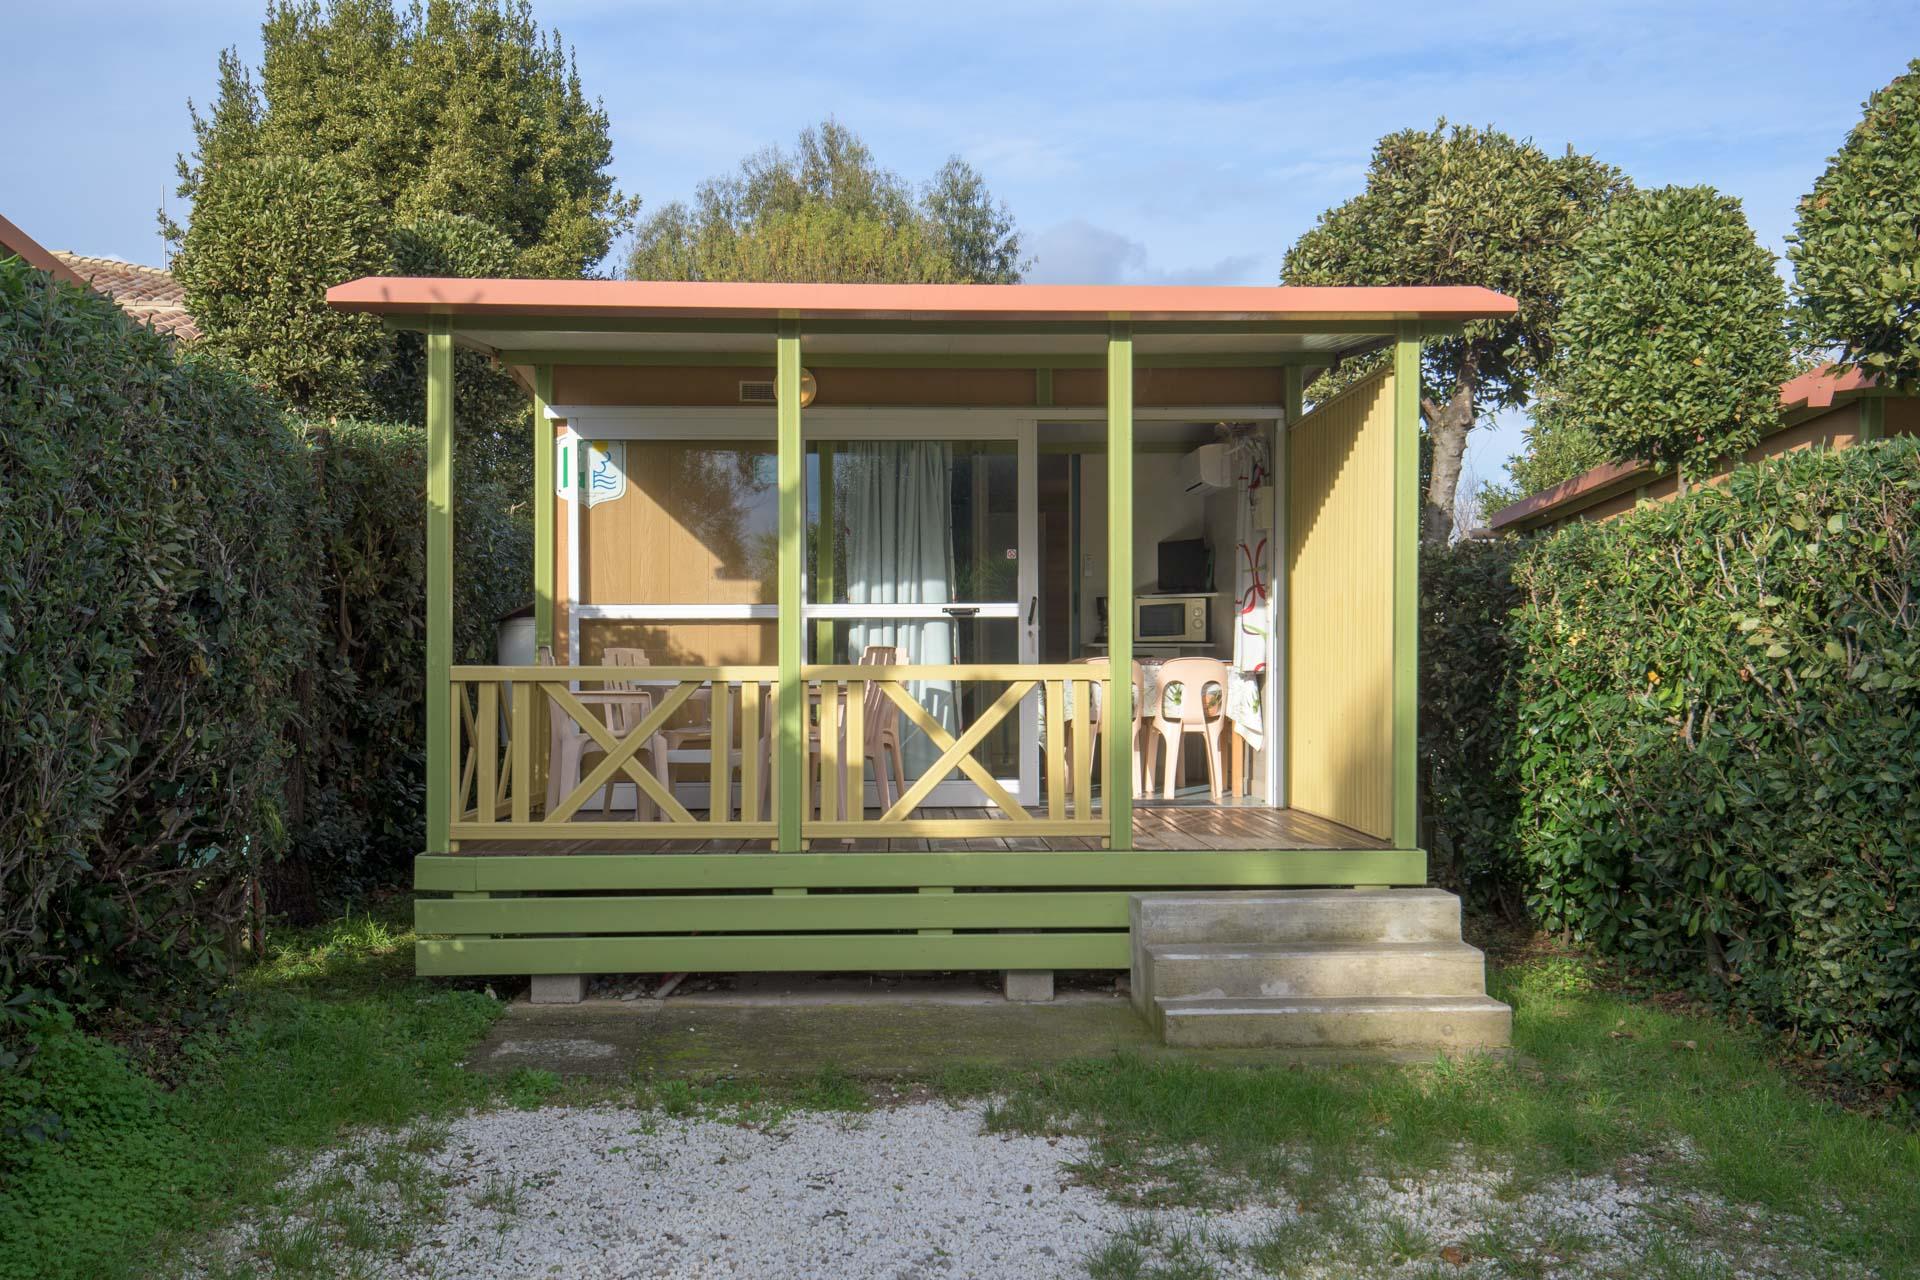 Chalet ILO 19 m² / 2 chambres - Climatisation  / Terrasse couverte